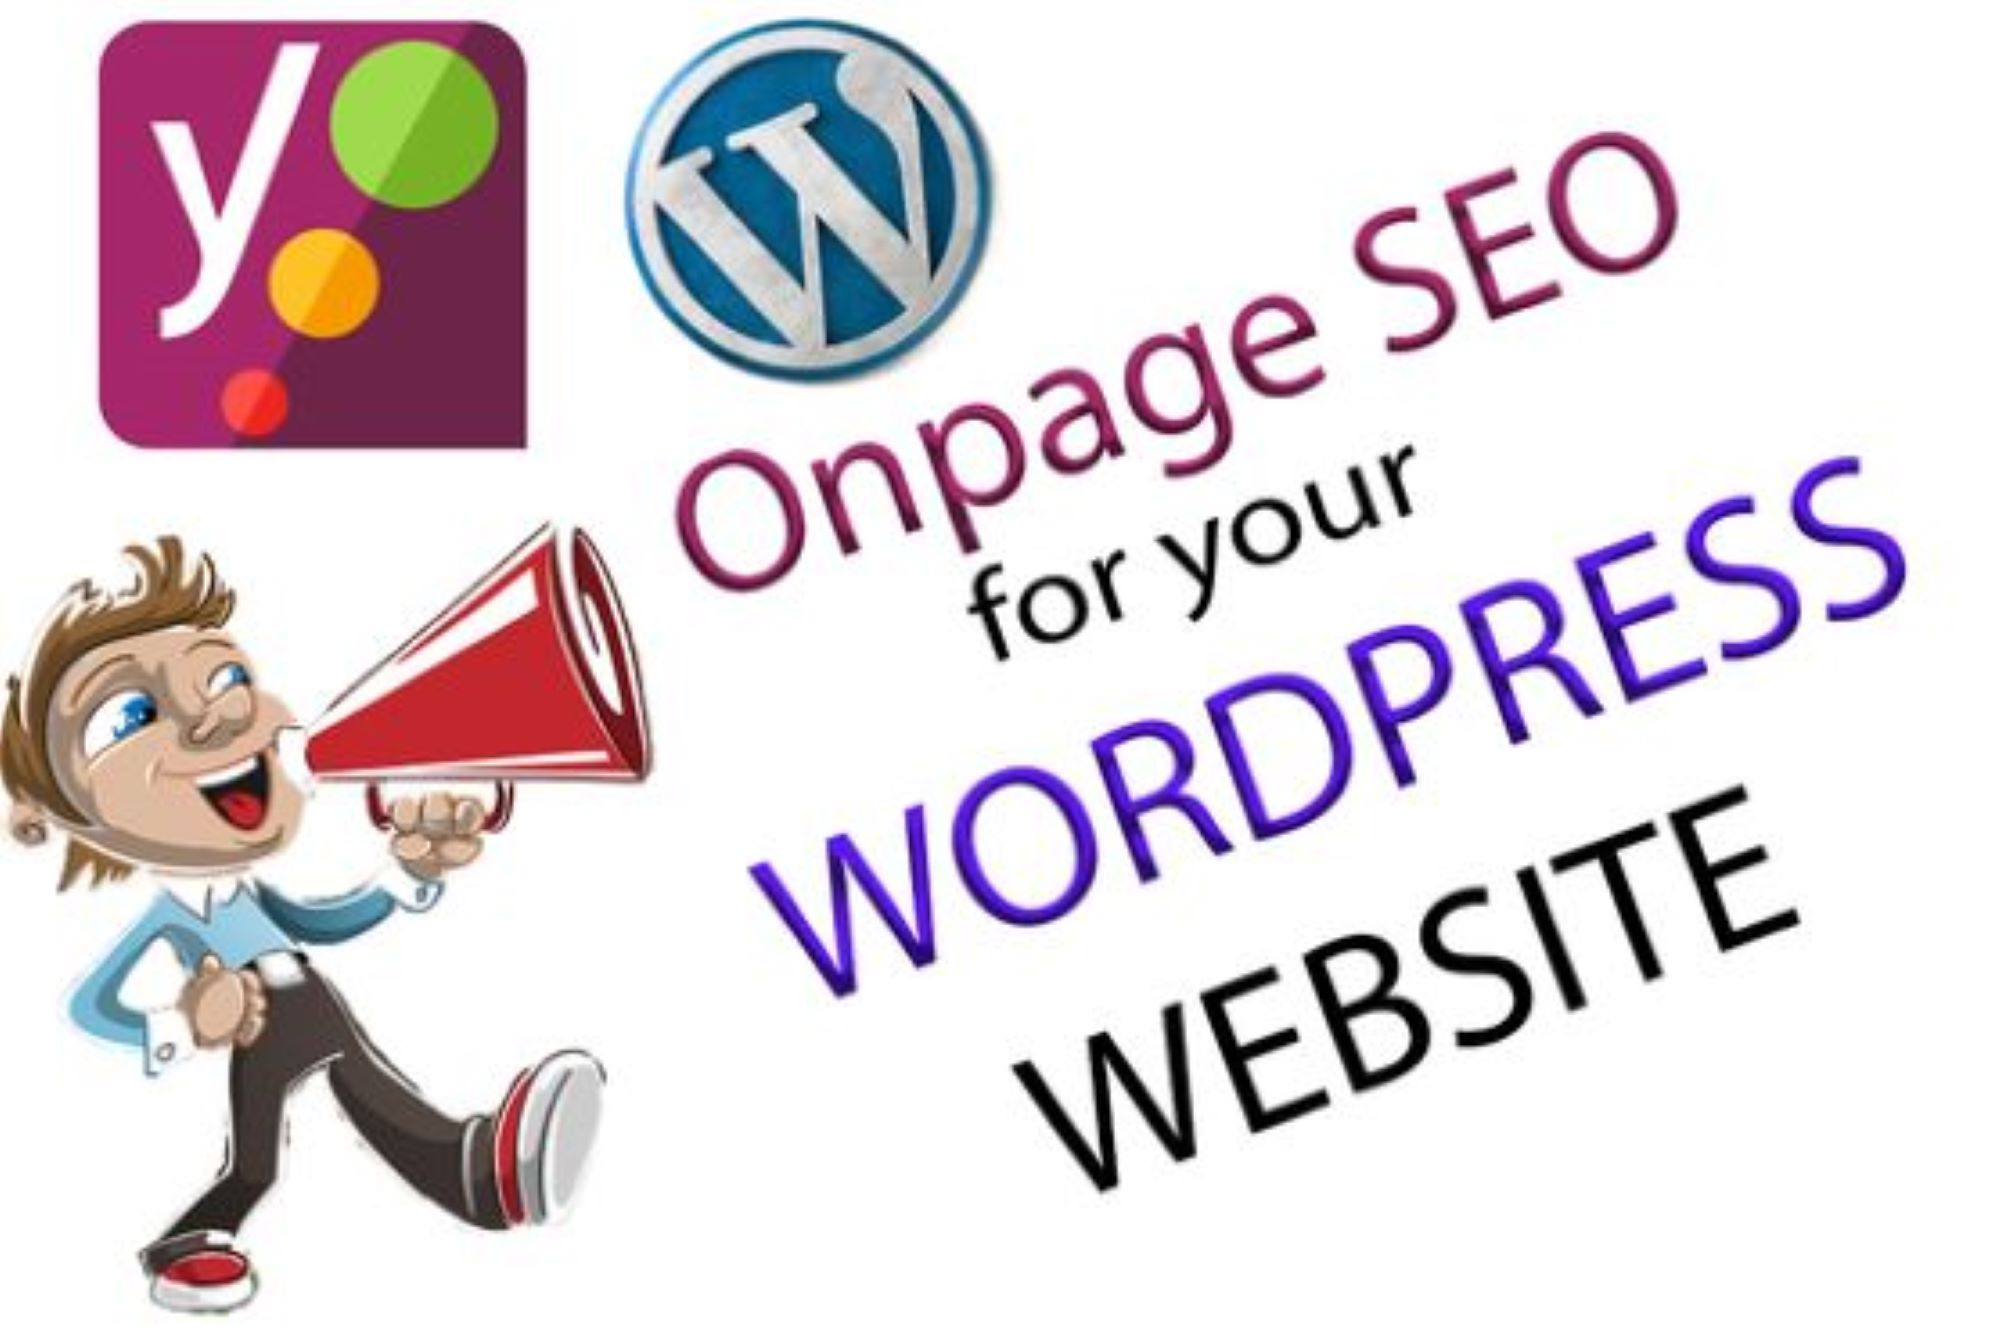 I will fix wordpress onpage or onsite issues with yoast SEO plugin